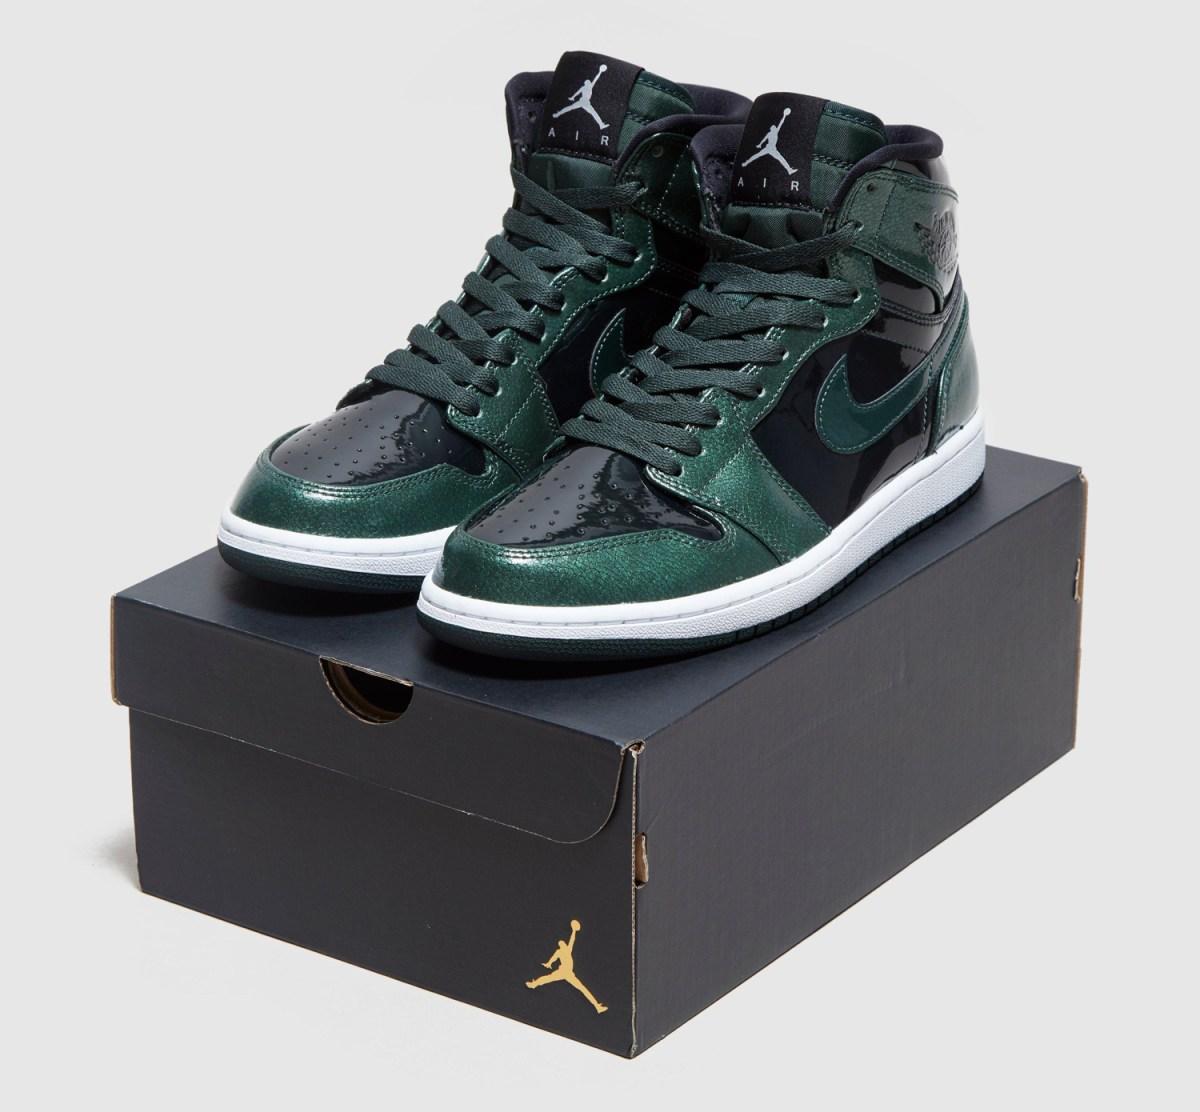 Air Jordan 1 Gorge Green Patent Leather 332550-300 Box